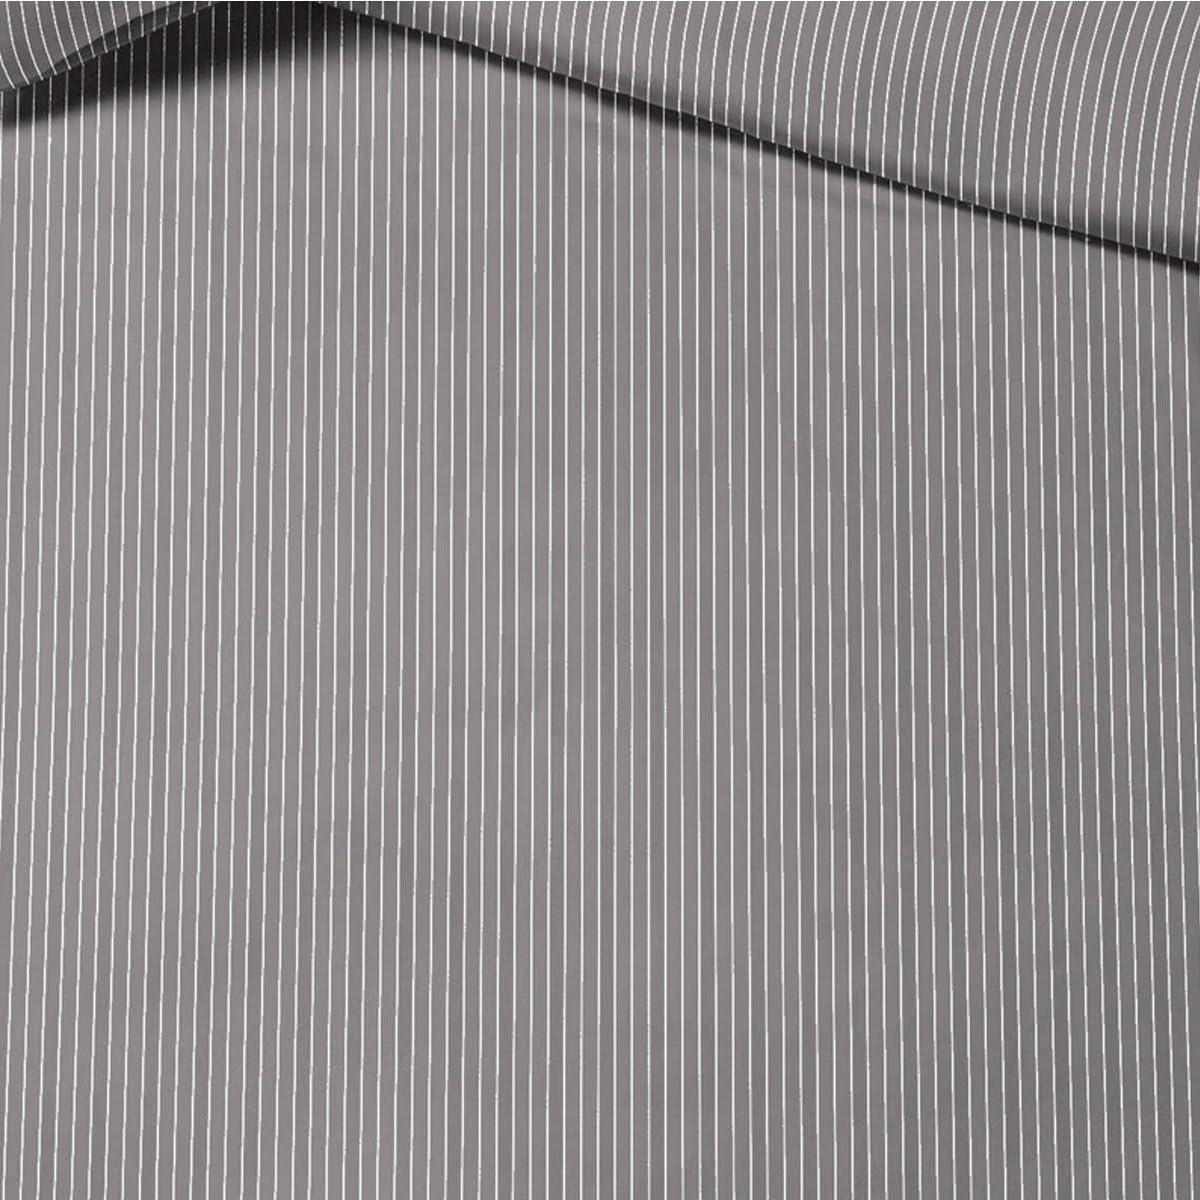 Fleuresse Gewebte Seersucker Bettw/äsche Rio Nadelstreifen 443700 Mint 1 Kissenbezug 80x80 cm 1 Bettbezug 135x200 cm